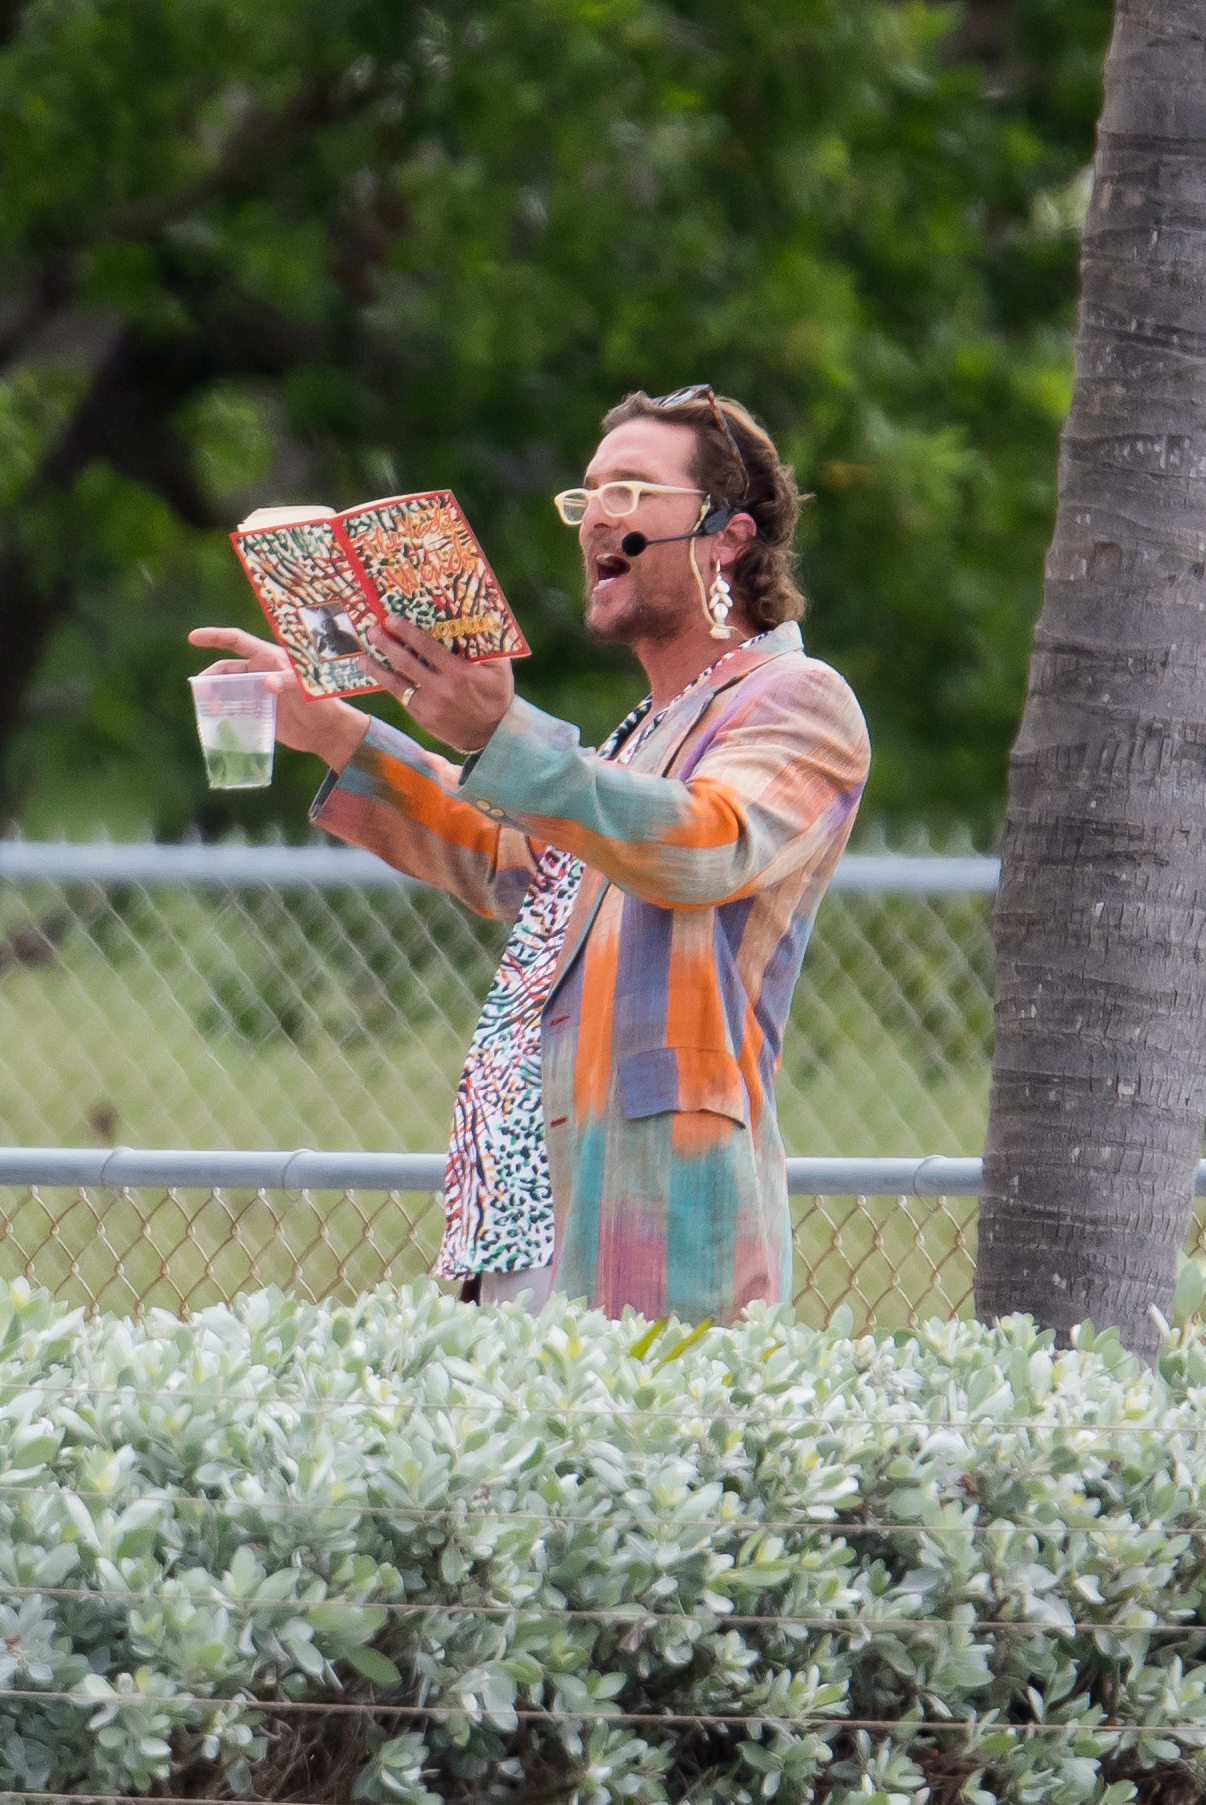 Matthew McConaughey films in Miami on Nov. 2, 2017.